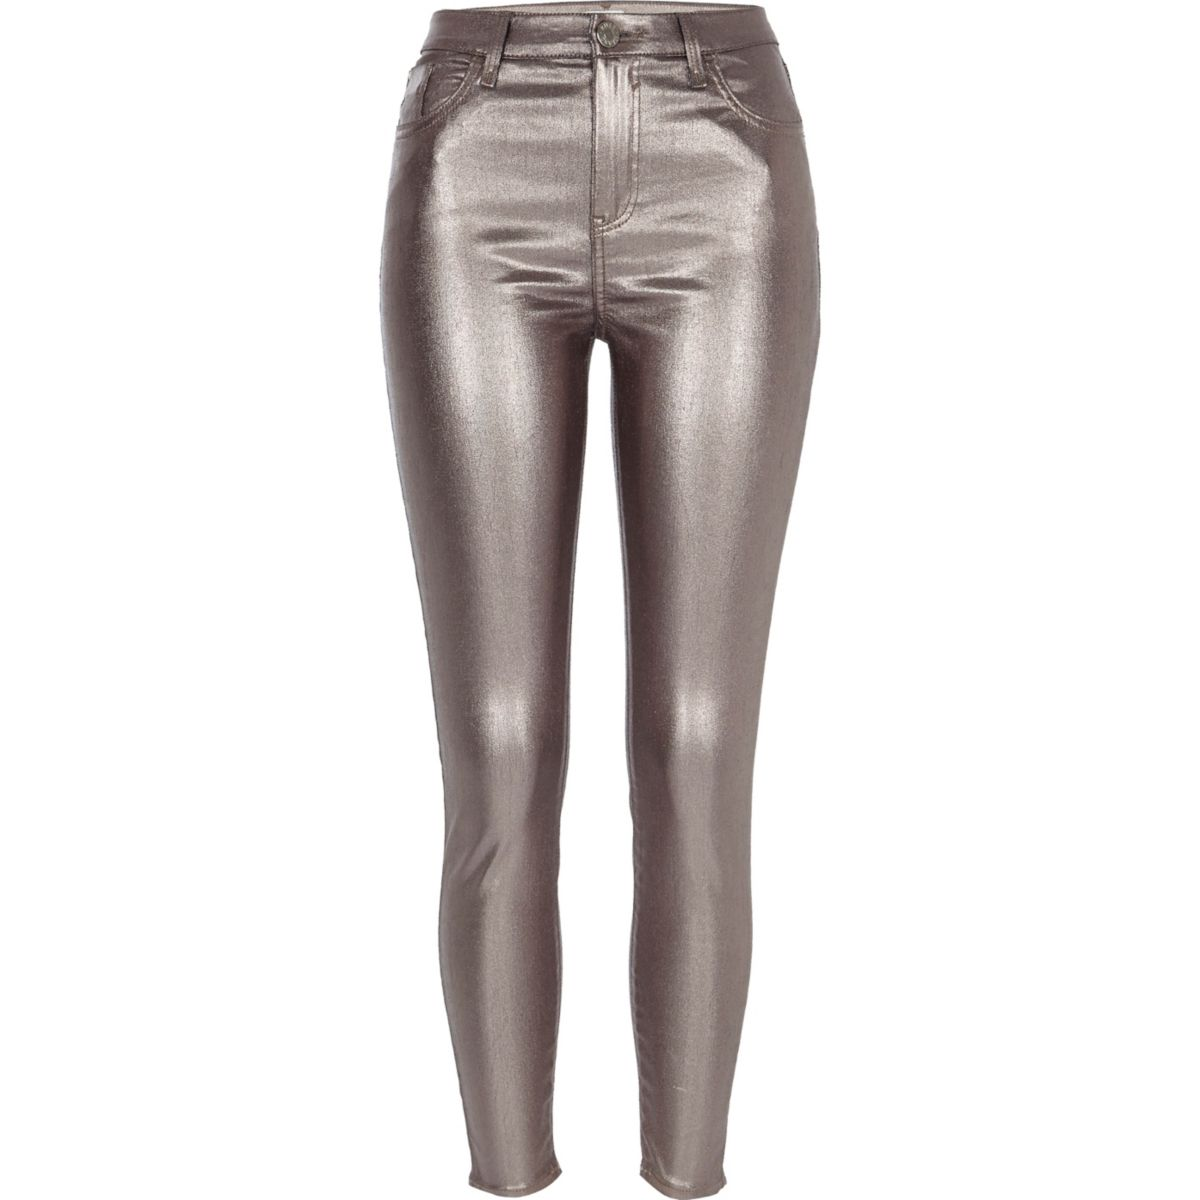 Silver metallic Amelie super skinny jeans